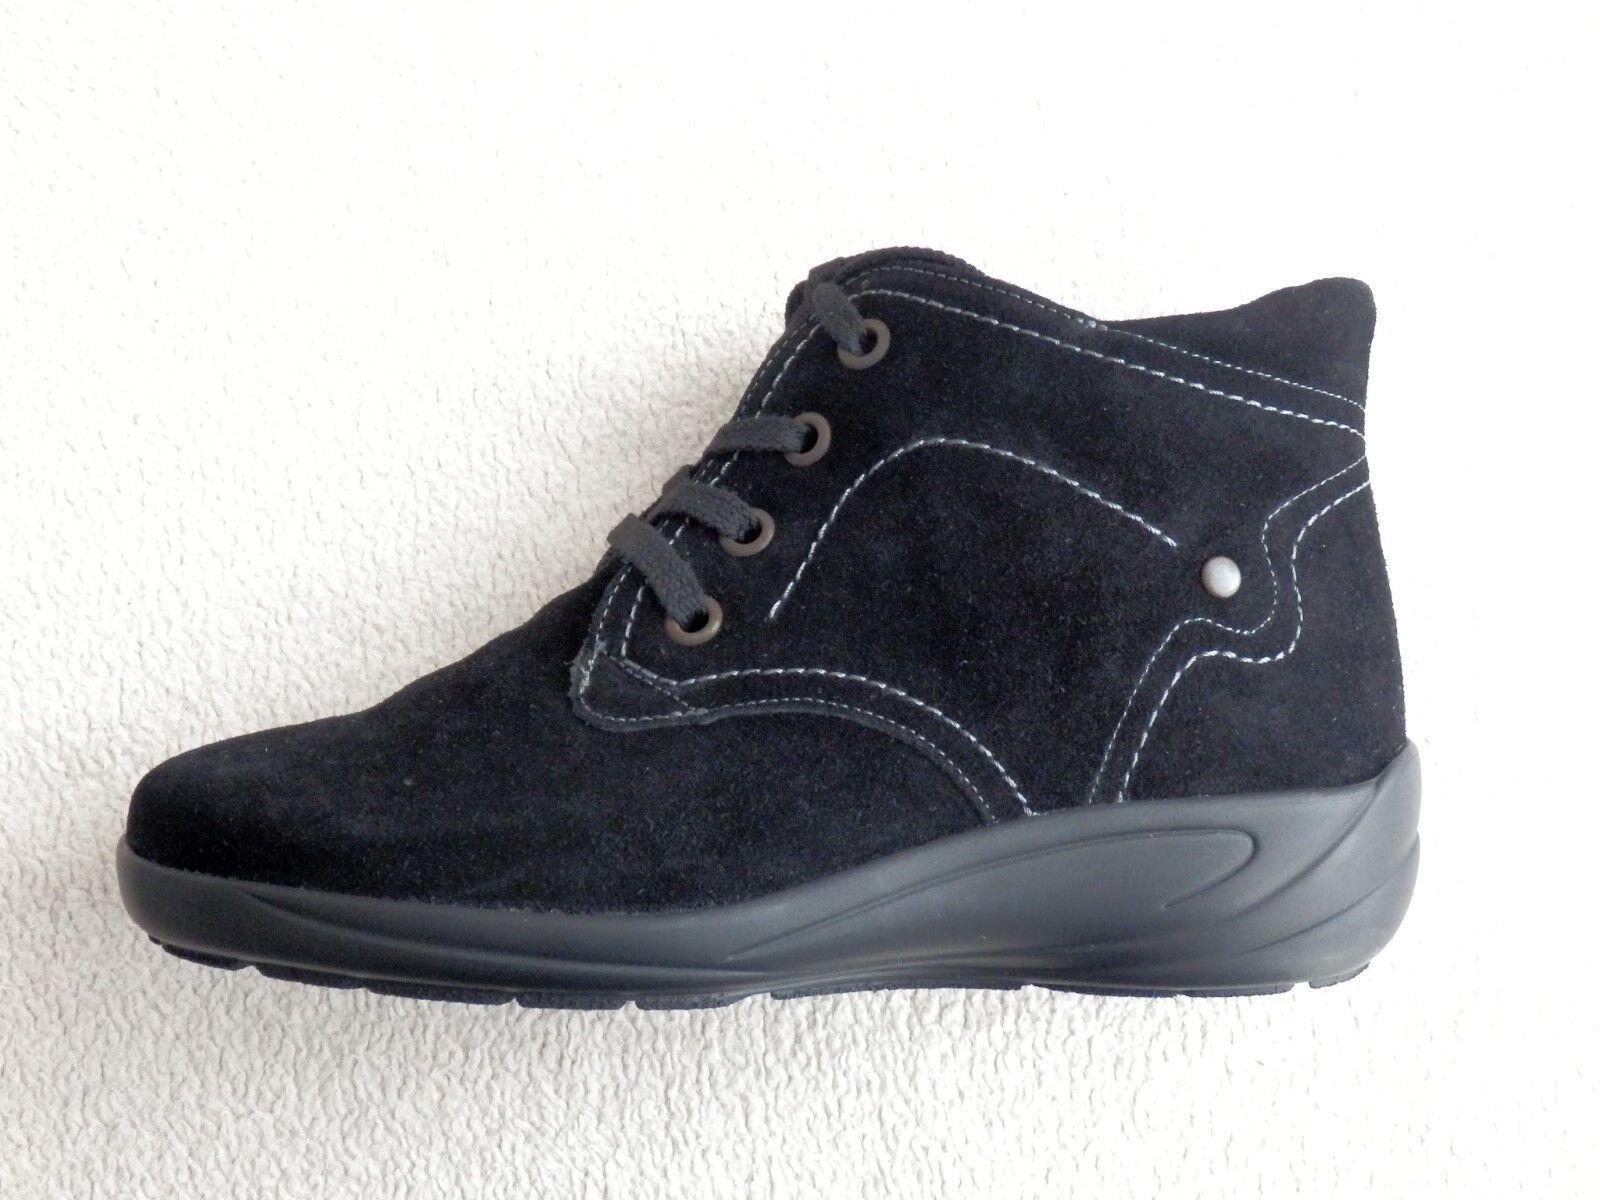 Semler schwarz Birgit Kurzschaft Stiefel Stiefelette schwarz Semler Gr. 33 38 39 41Weite H 28d181